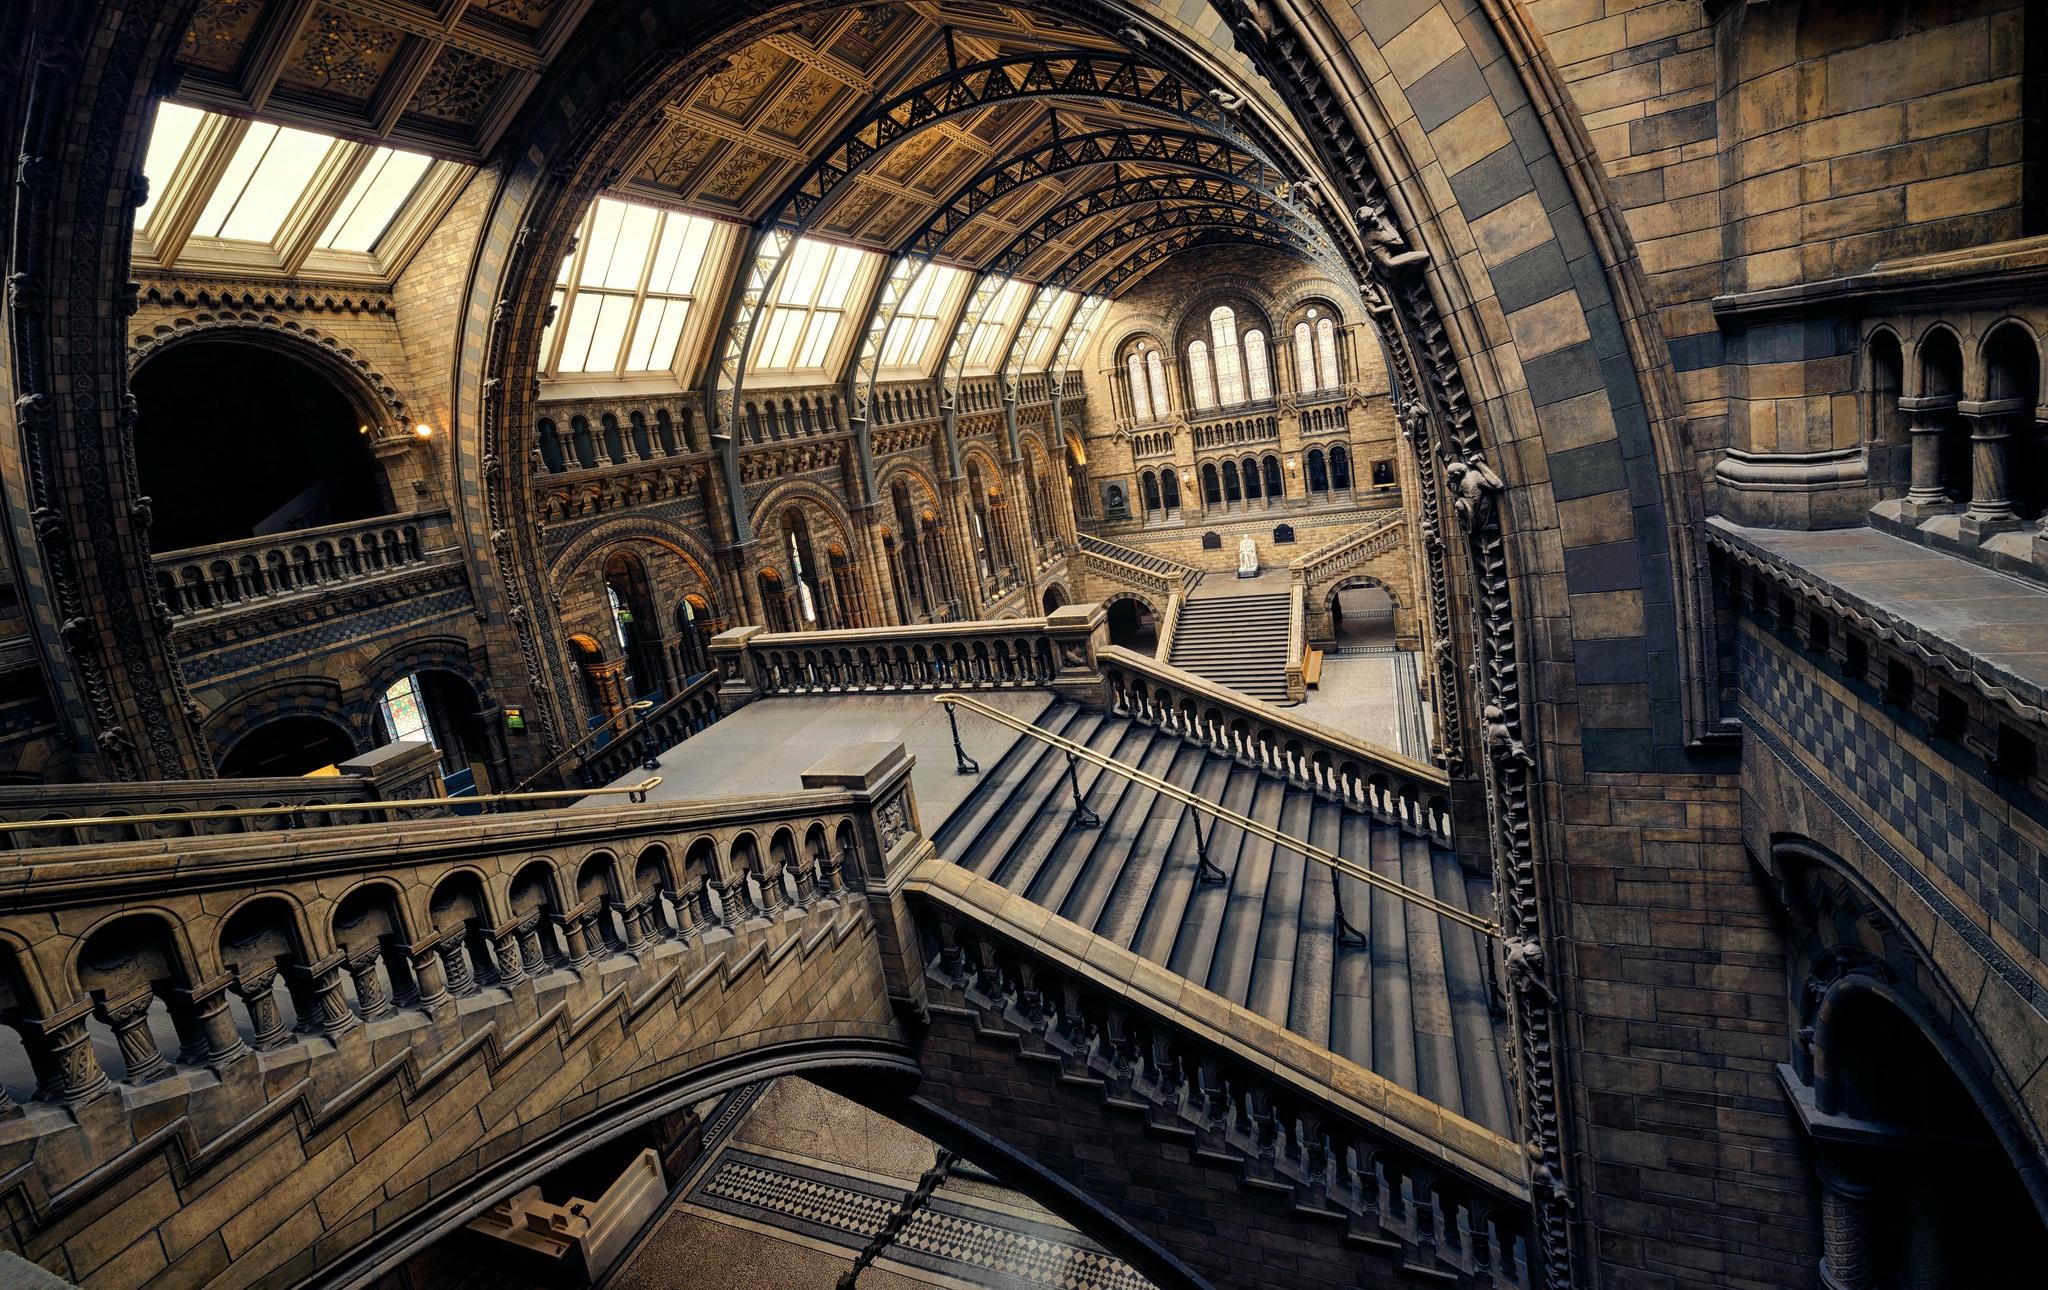 Wallpaper 2048x1290 Px Arch Building Interior London